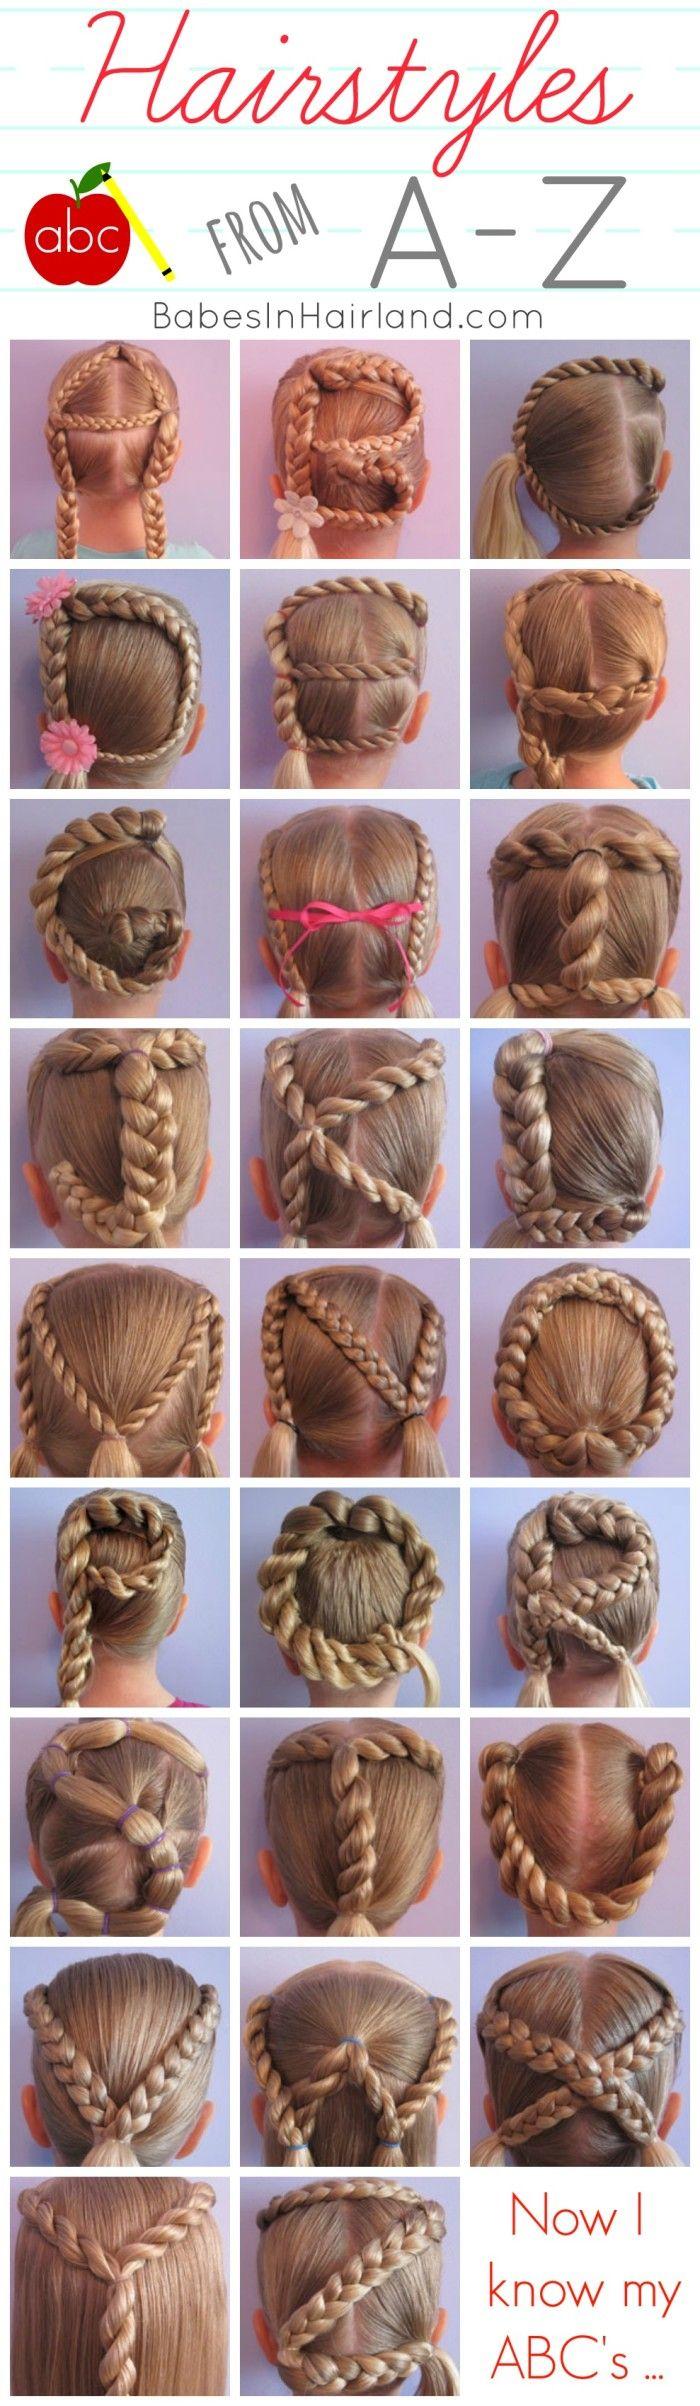 ABC Hair Video & Kindergarten | Babes In Hairland | PinToxic